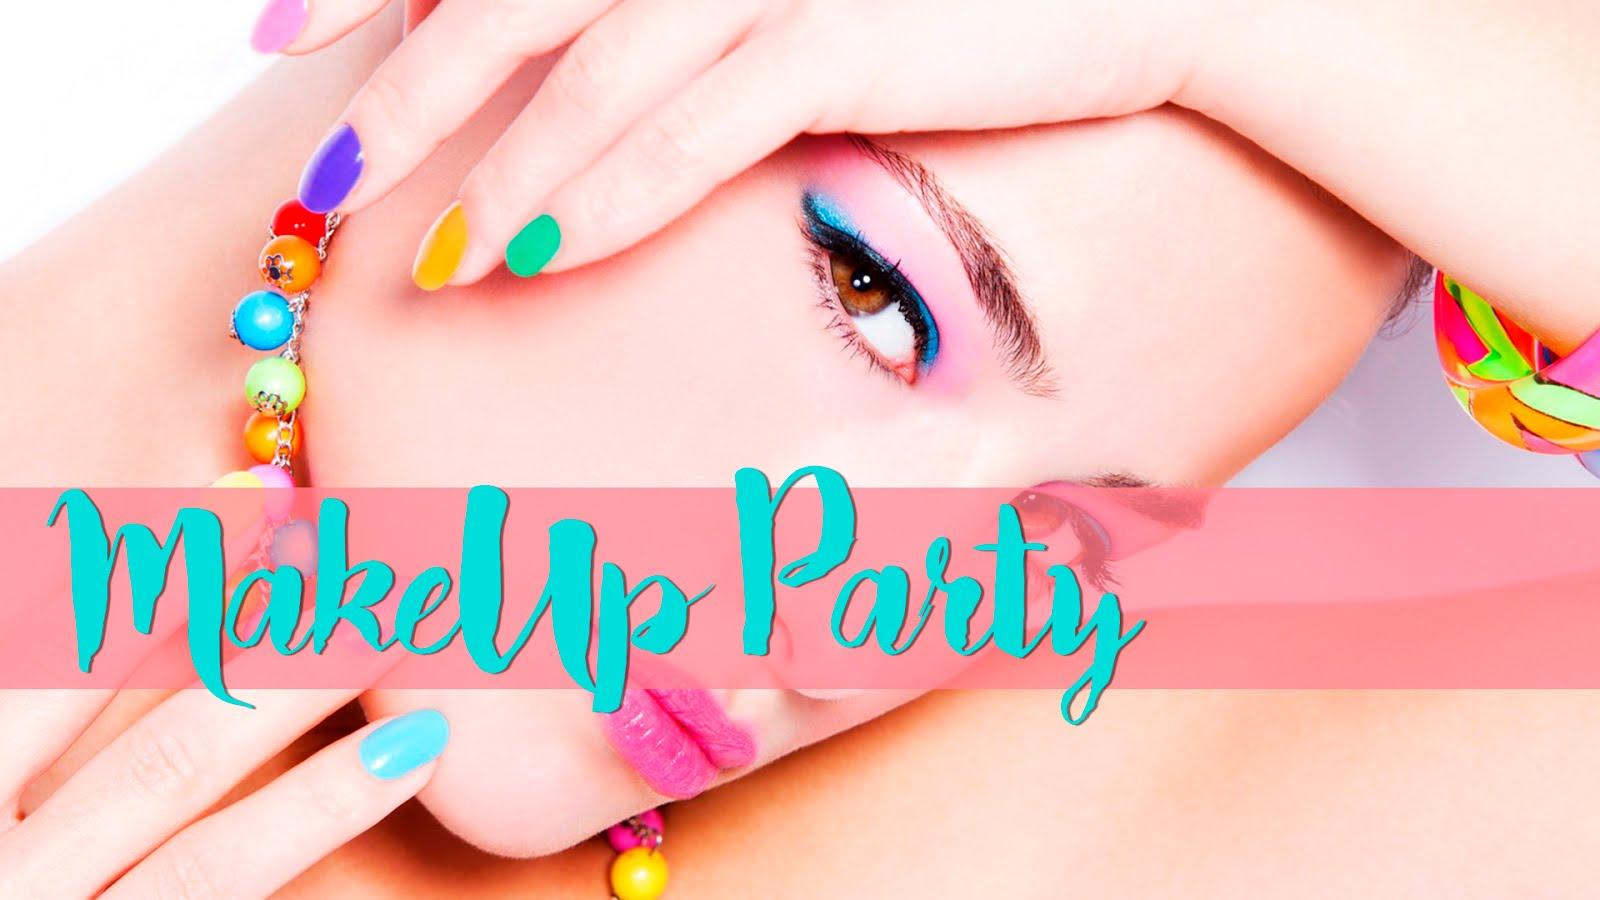 http://bridacoelho.blogspot.com.es/p/make-up-party.html